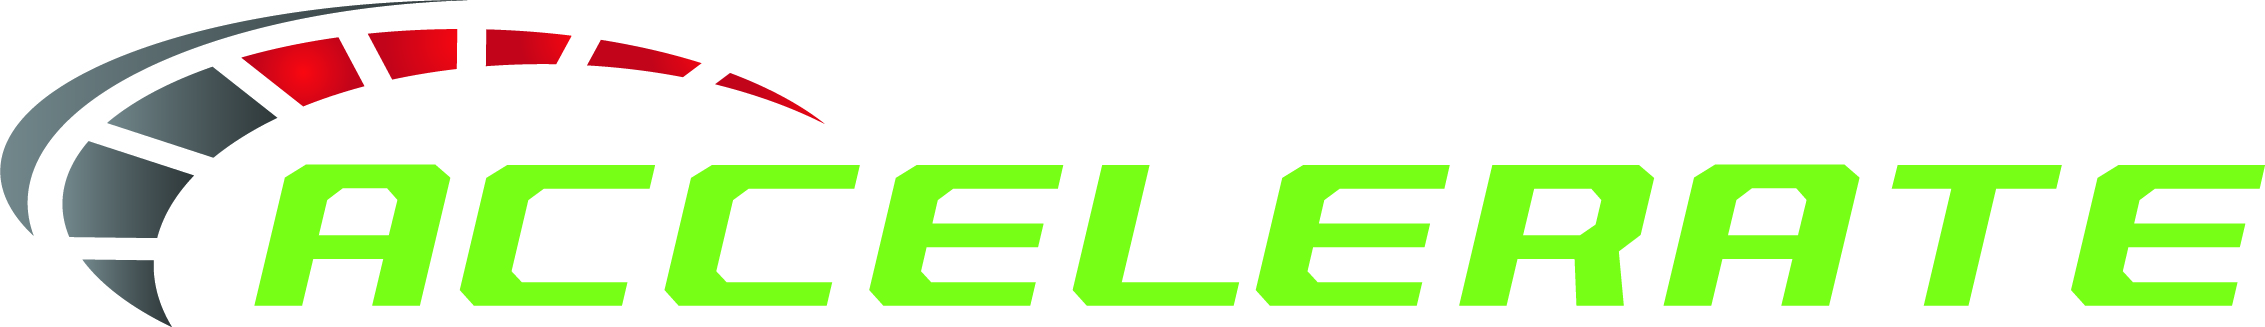 CFADA Accelerate Logo